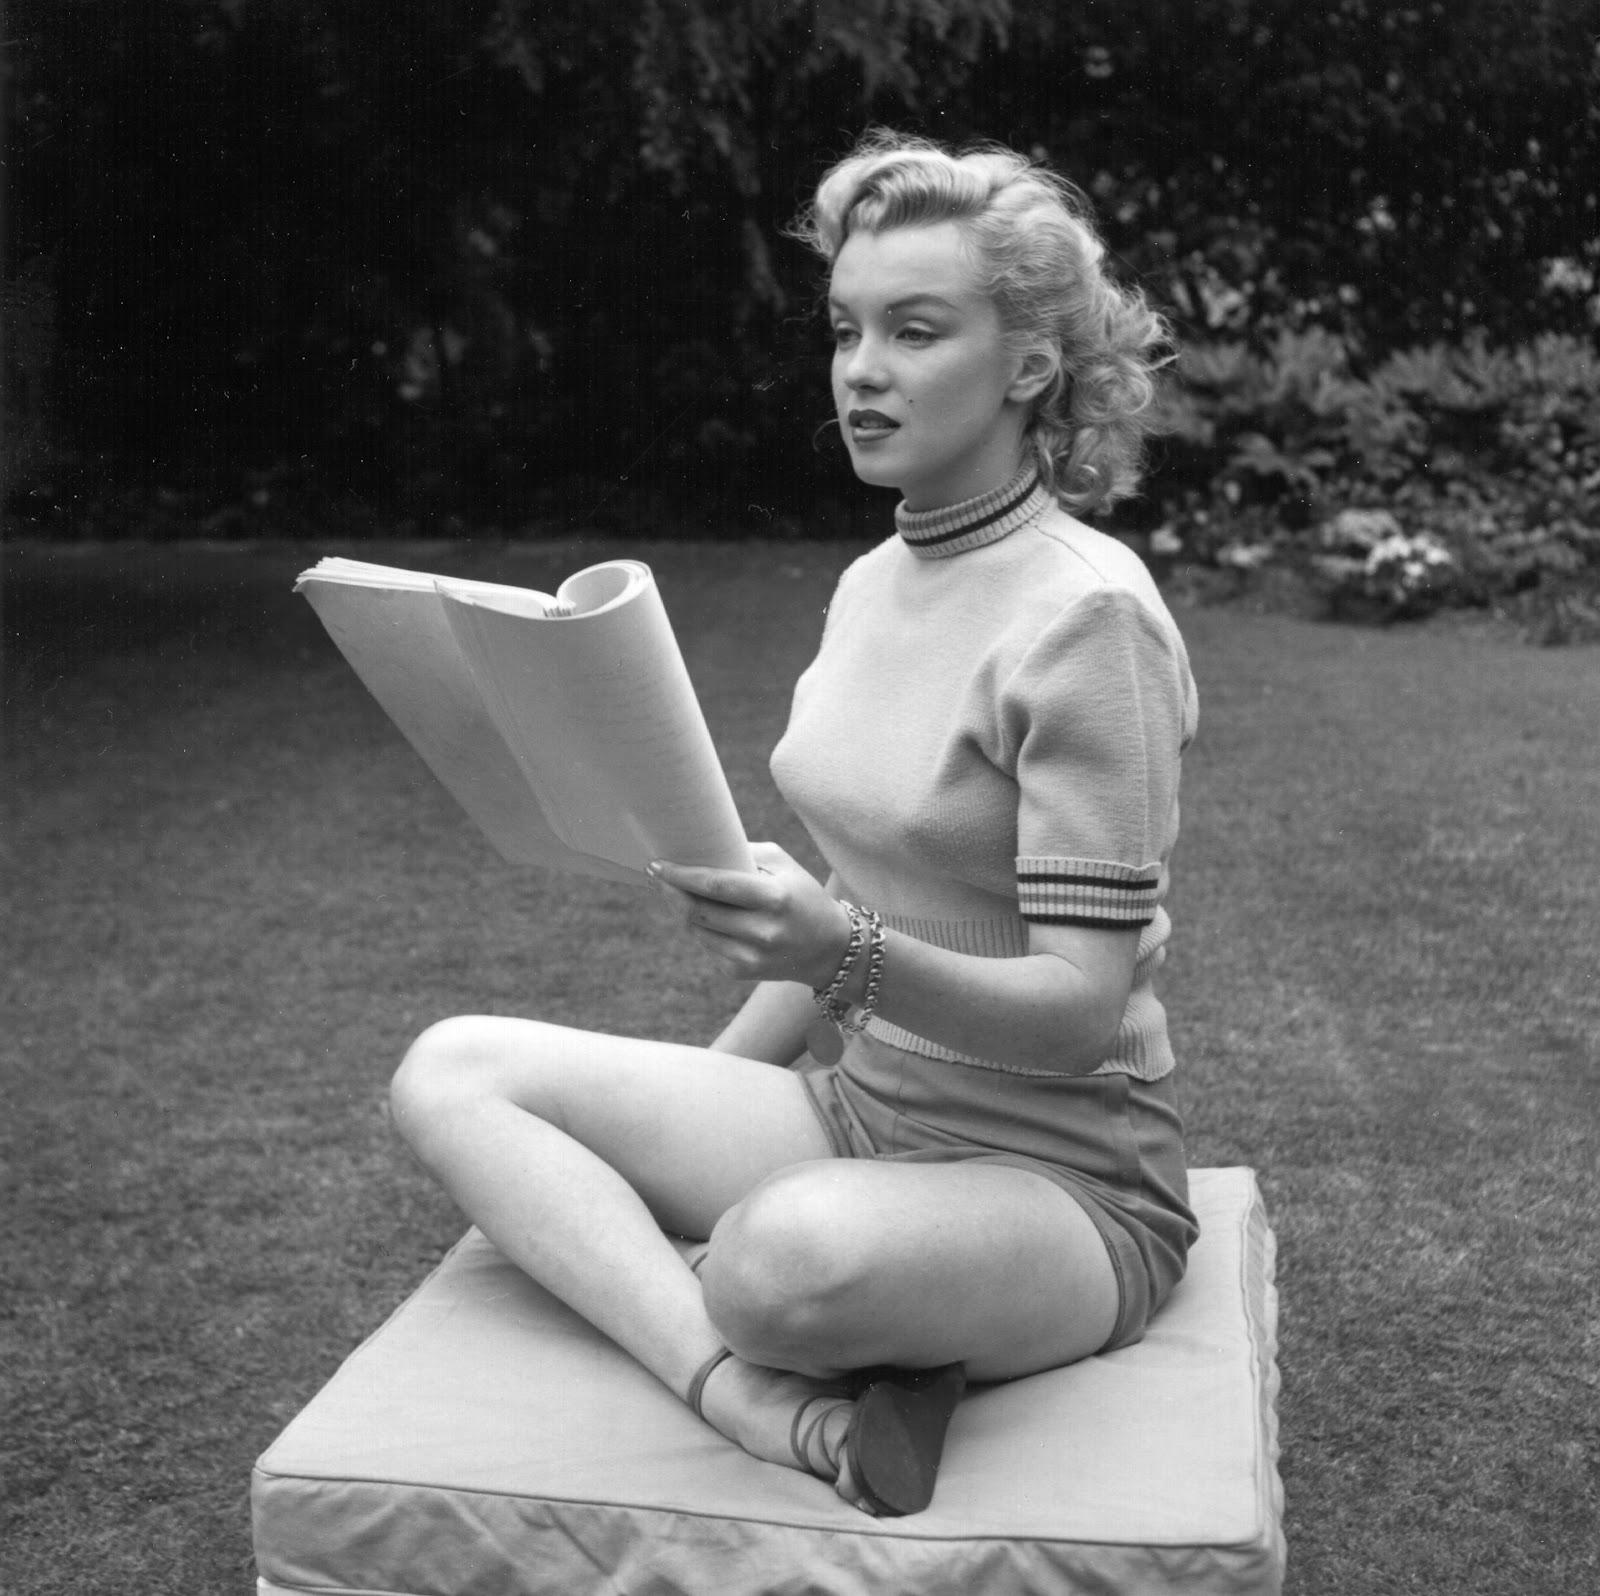 Marilyn Monroe Fashion Bikini Bodycon Underwear She